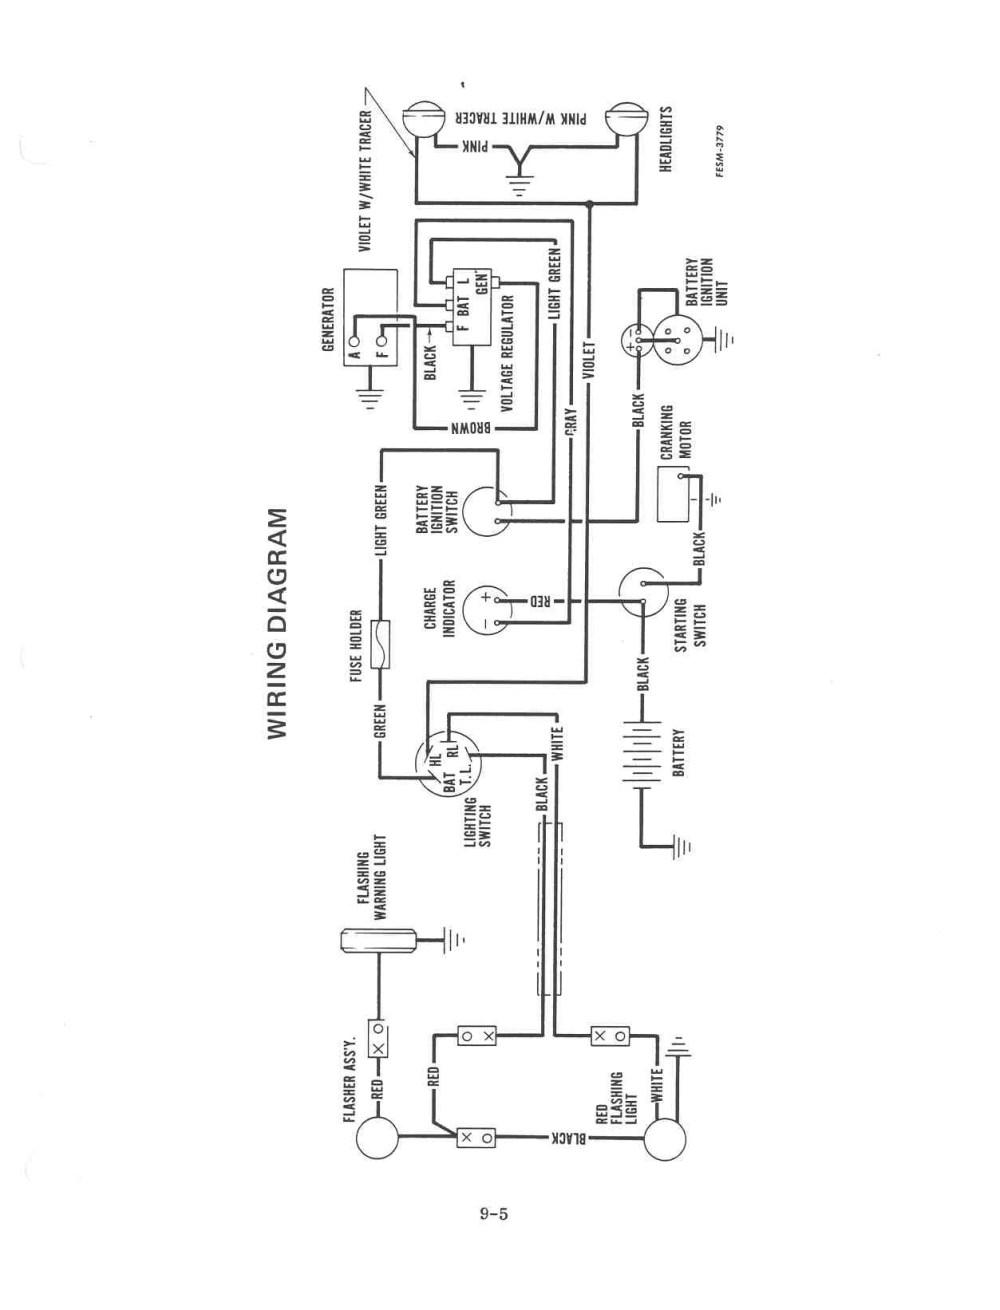 medium resolution of farmall 400 wiring diagram switch data schema u2022 kenworth wiring harness diagram farmall wiring harness